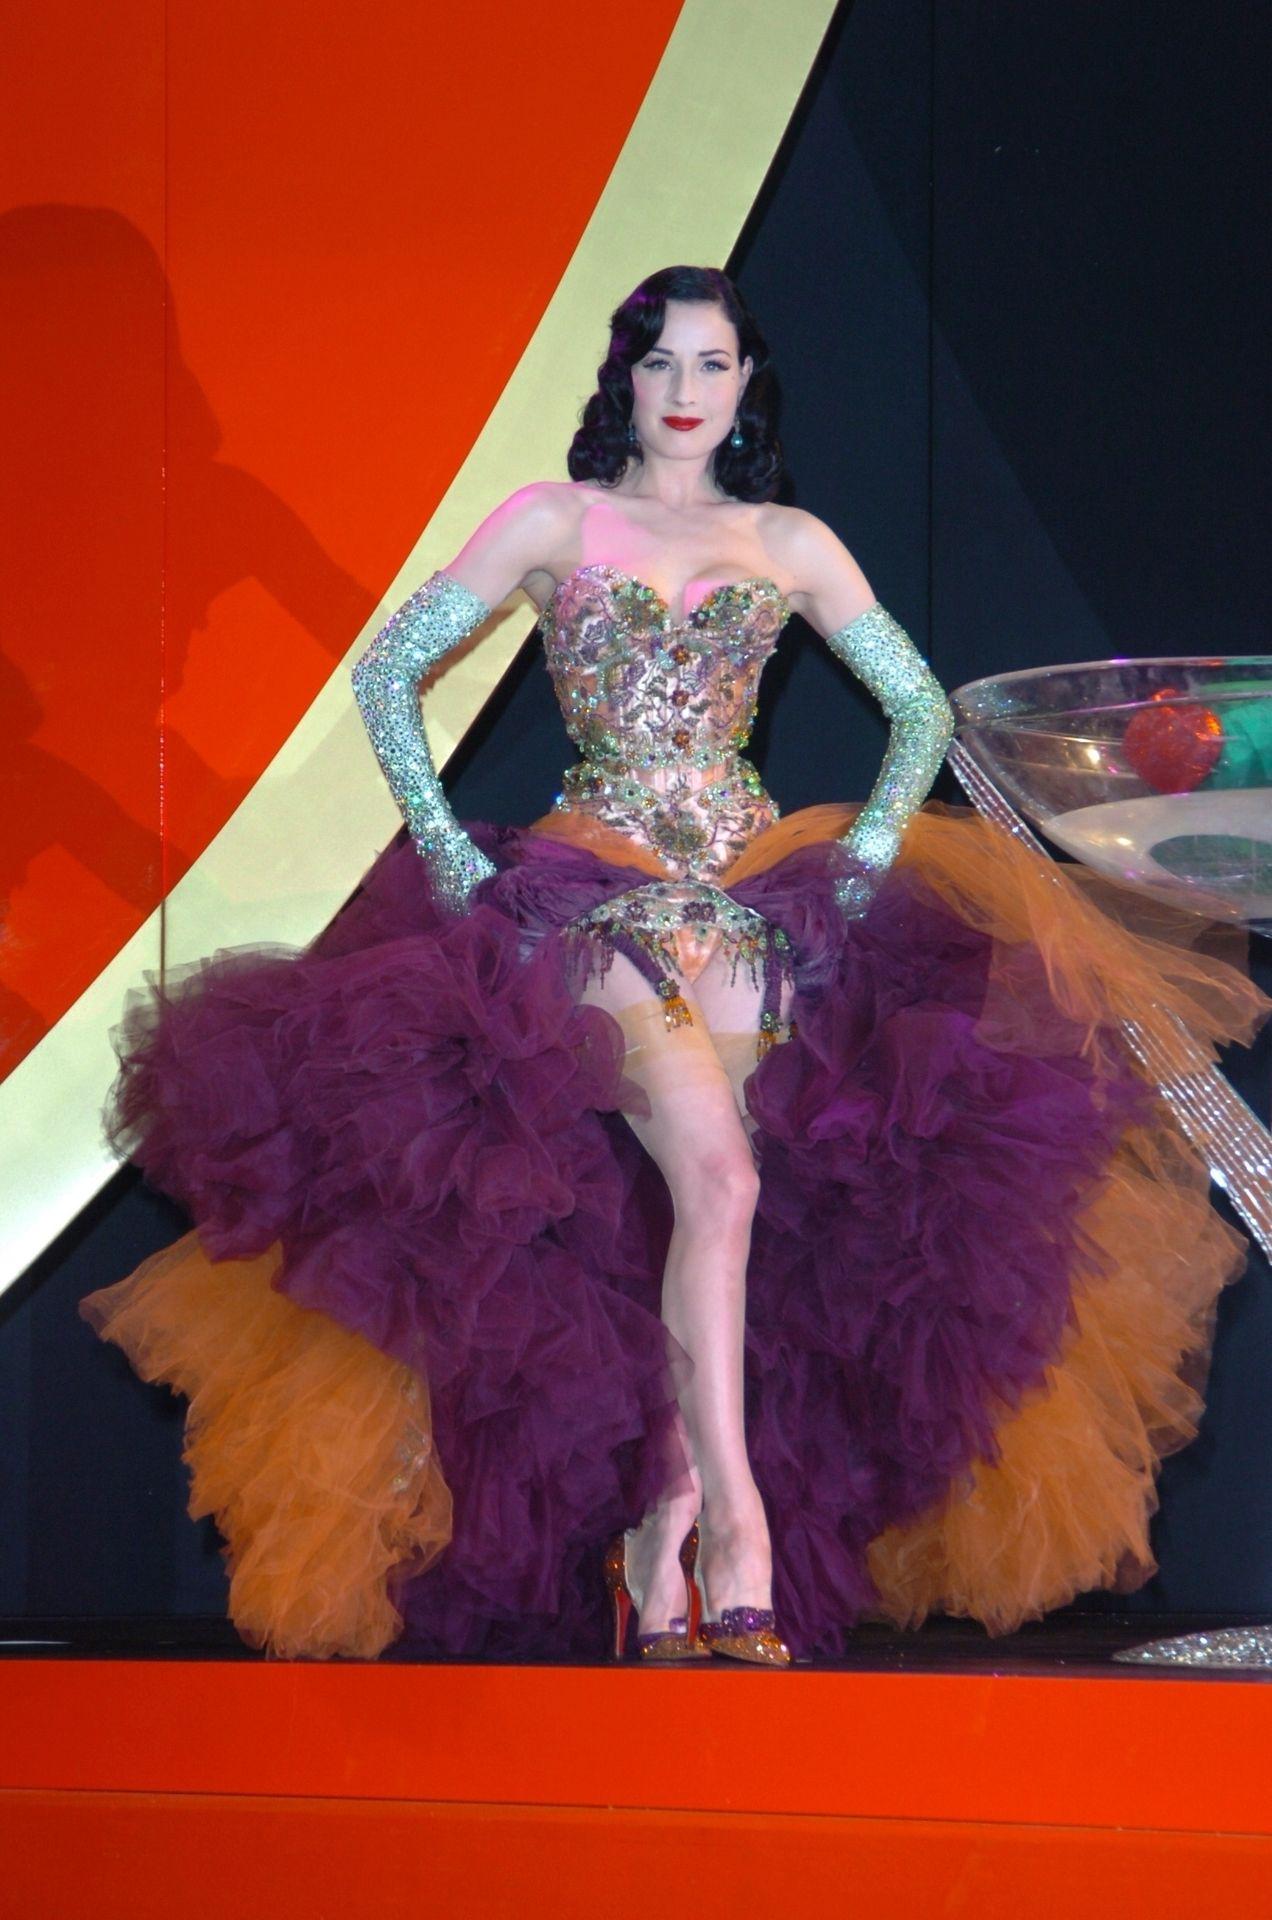 Dita Von Teese Performs At Erotica 06 In London 0005